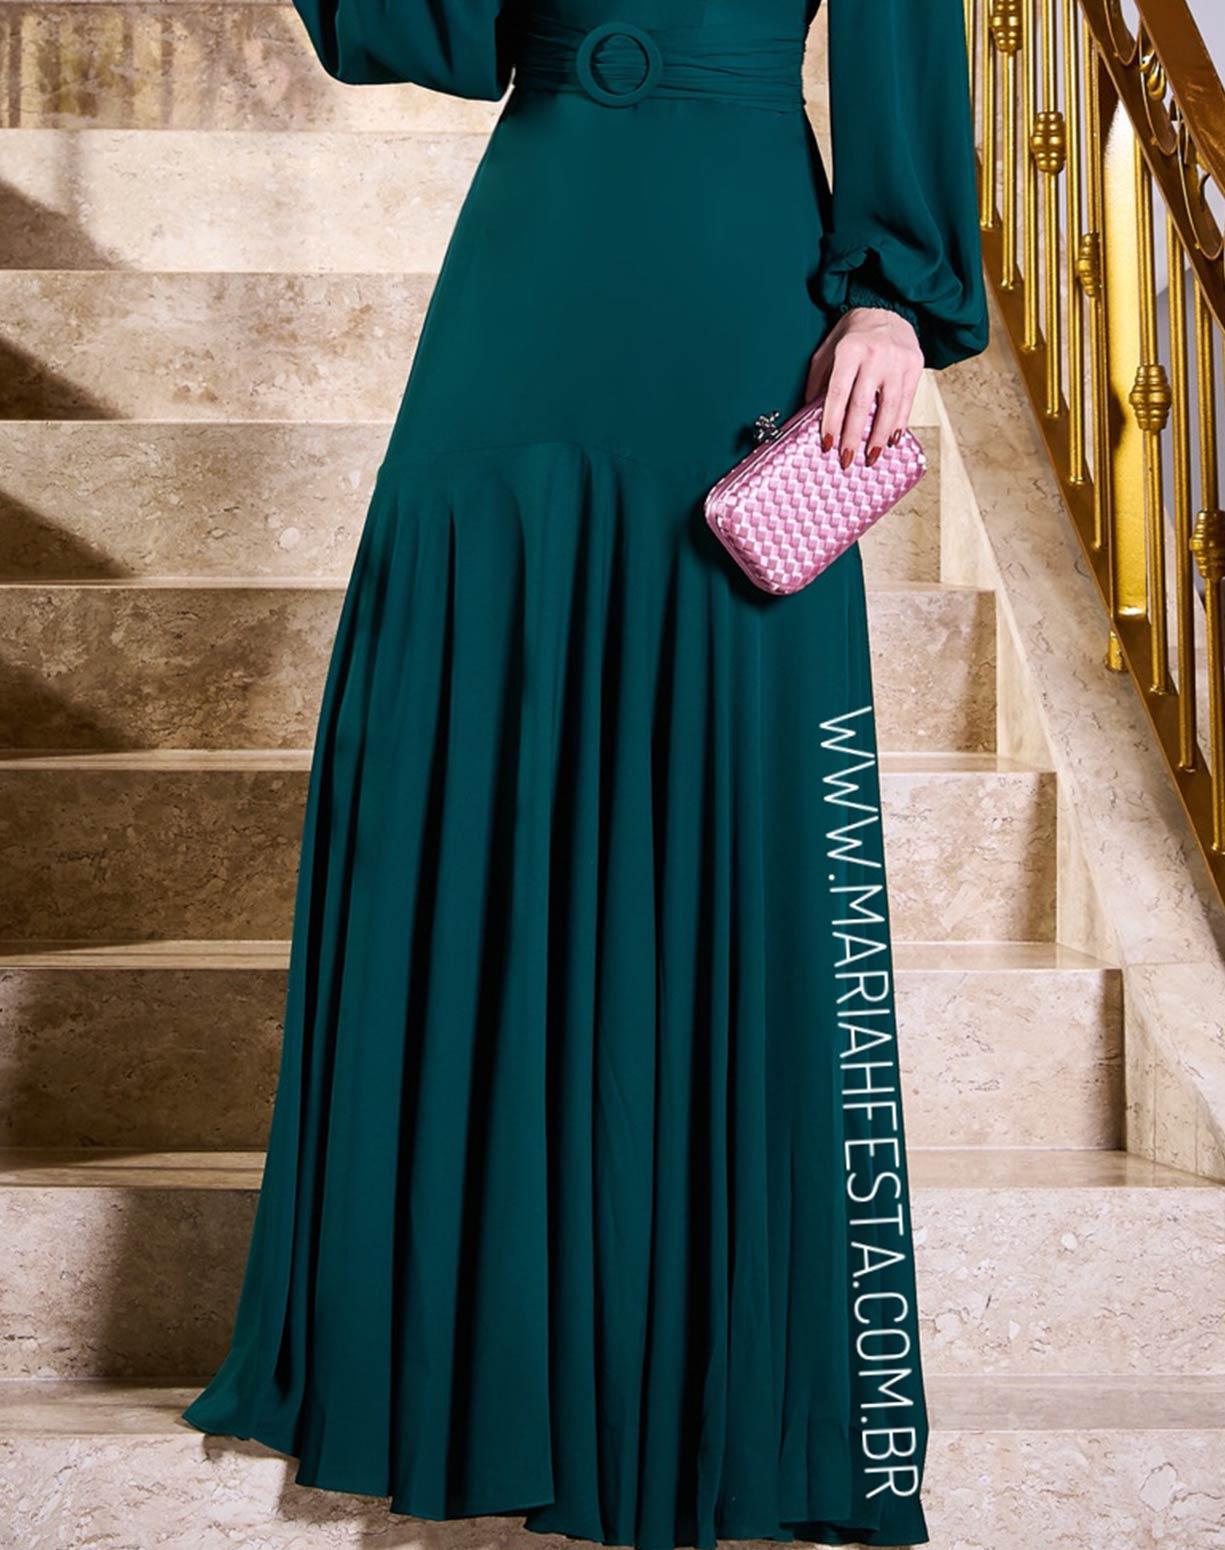 Vestido Verde Esmeralda Ombro a Ombro com Manga Longa